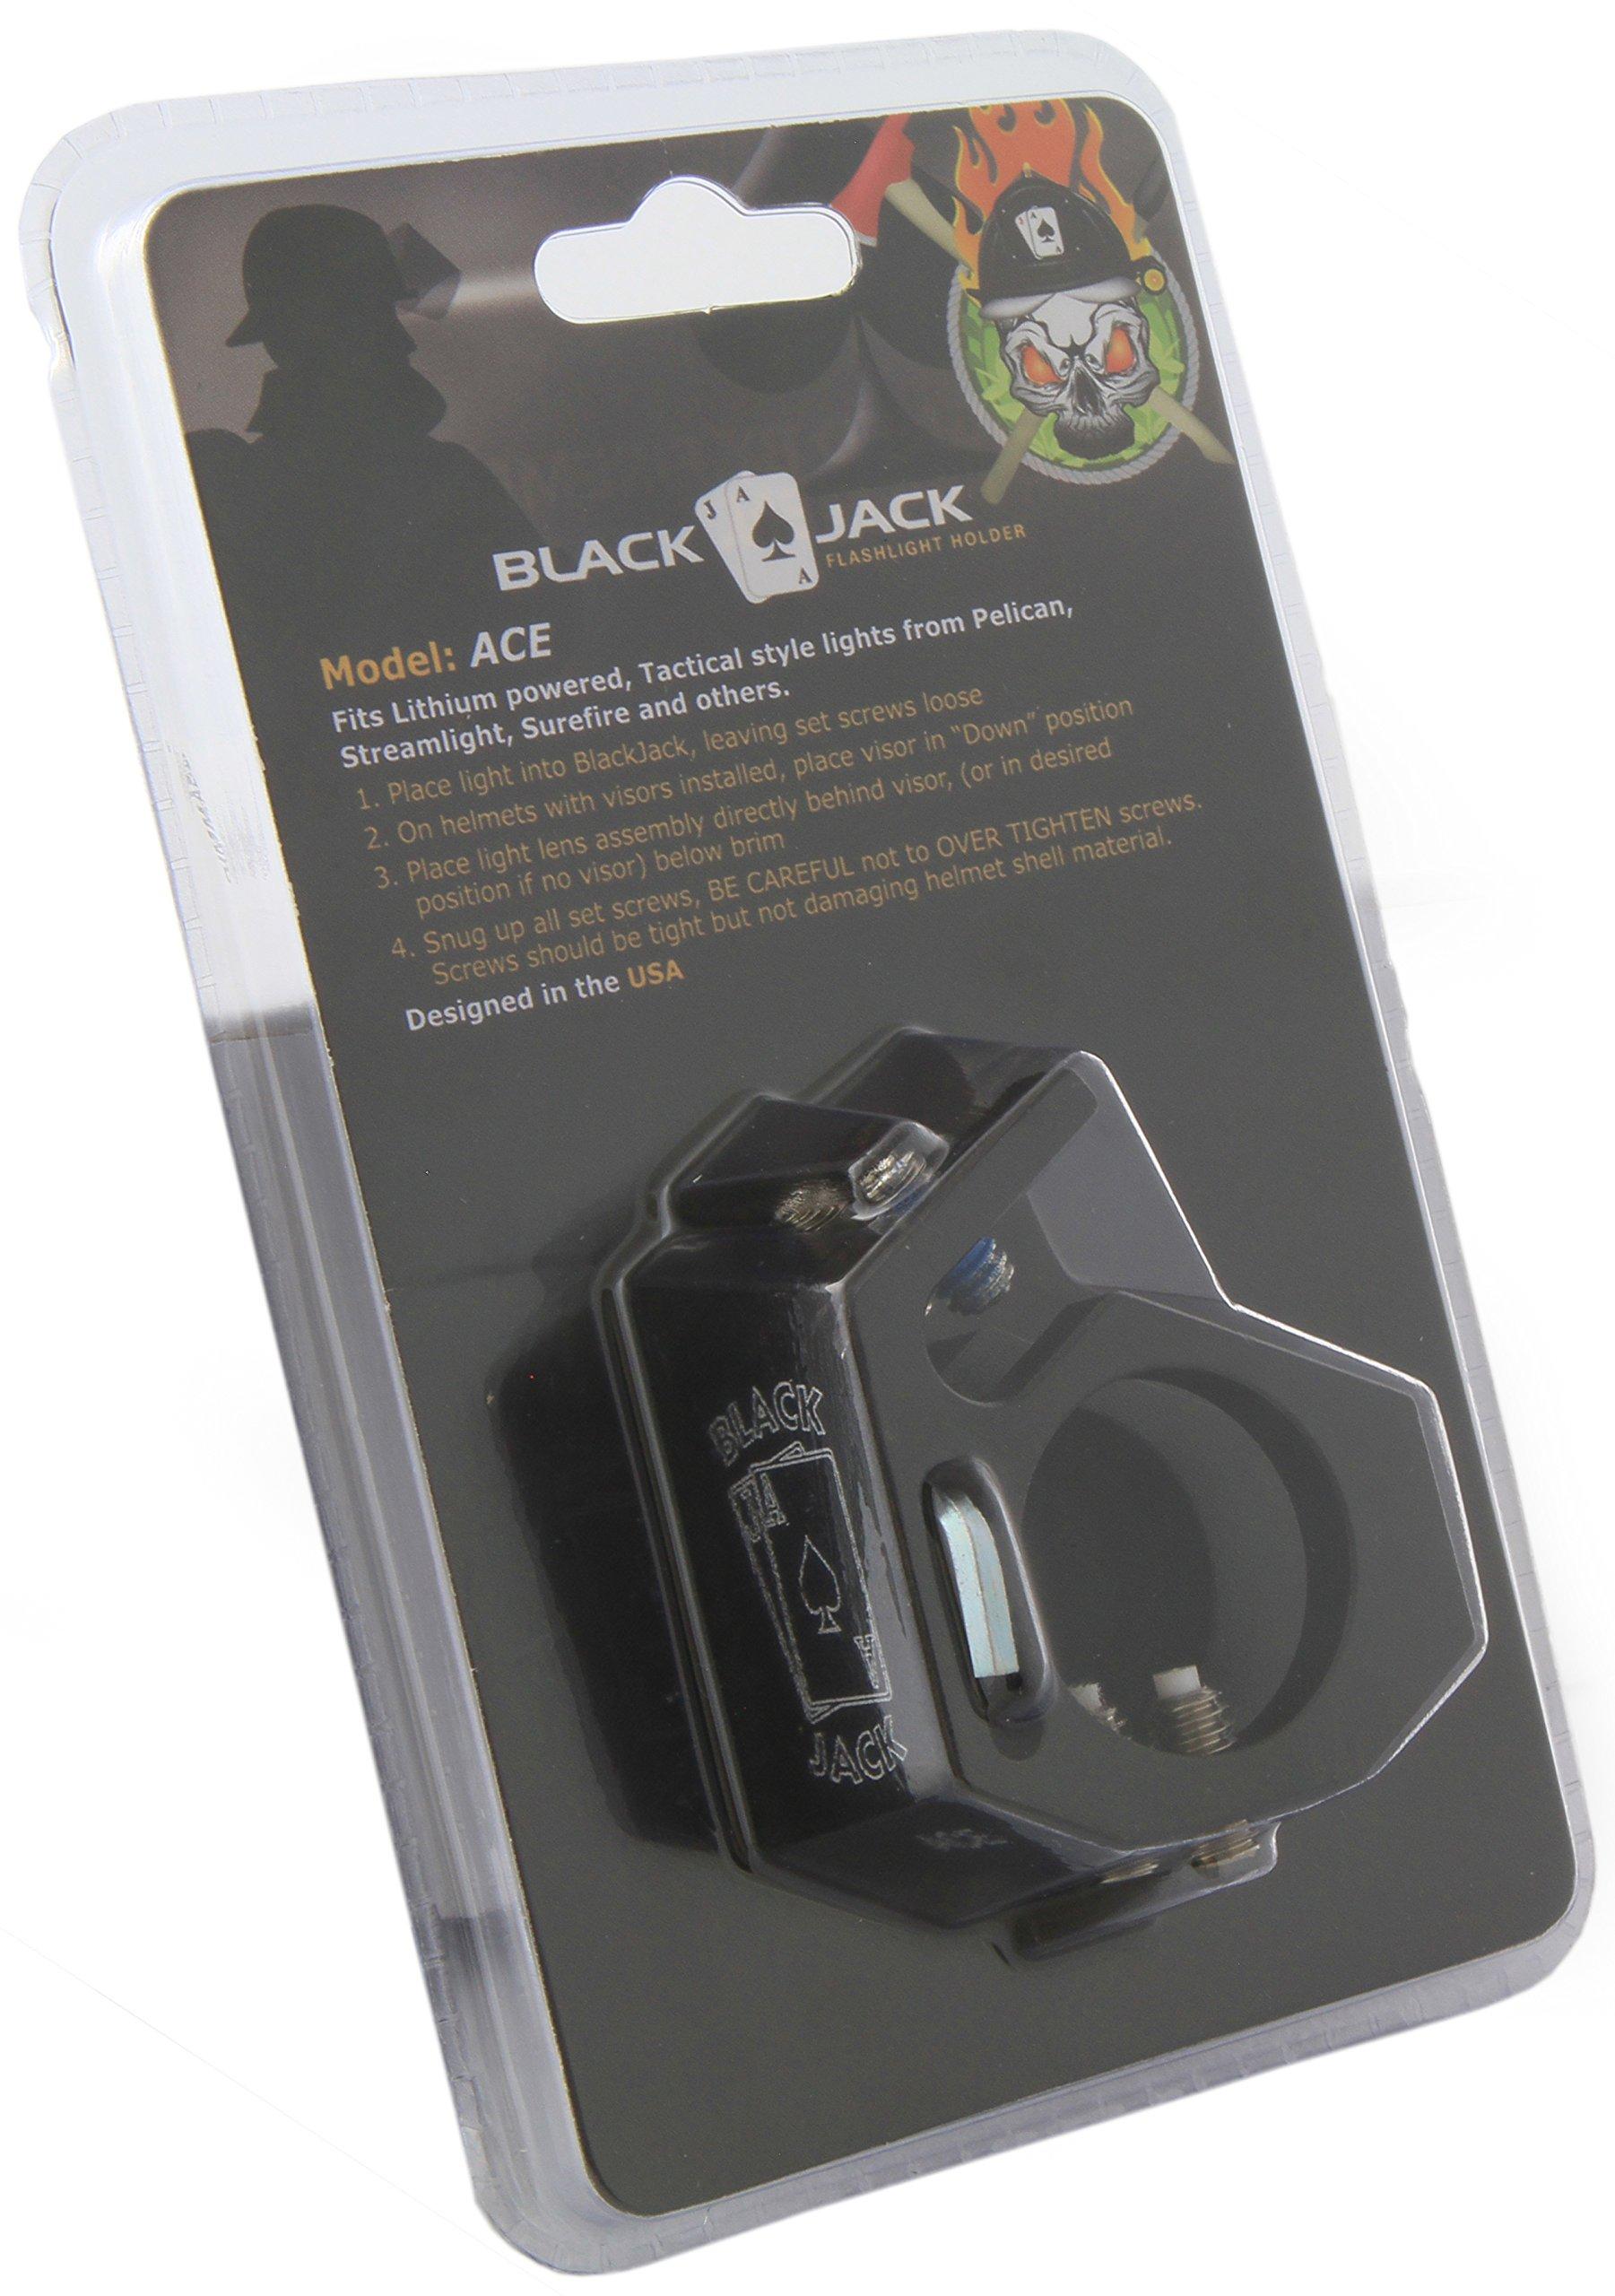 Blackjack ACE Firefighter Helmet Aluminum Flashlight Holder by Blackjack Fire & Safety (Image #9)